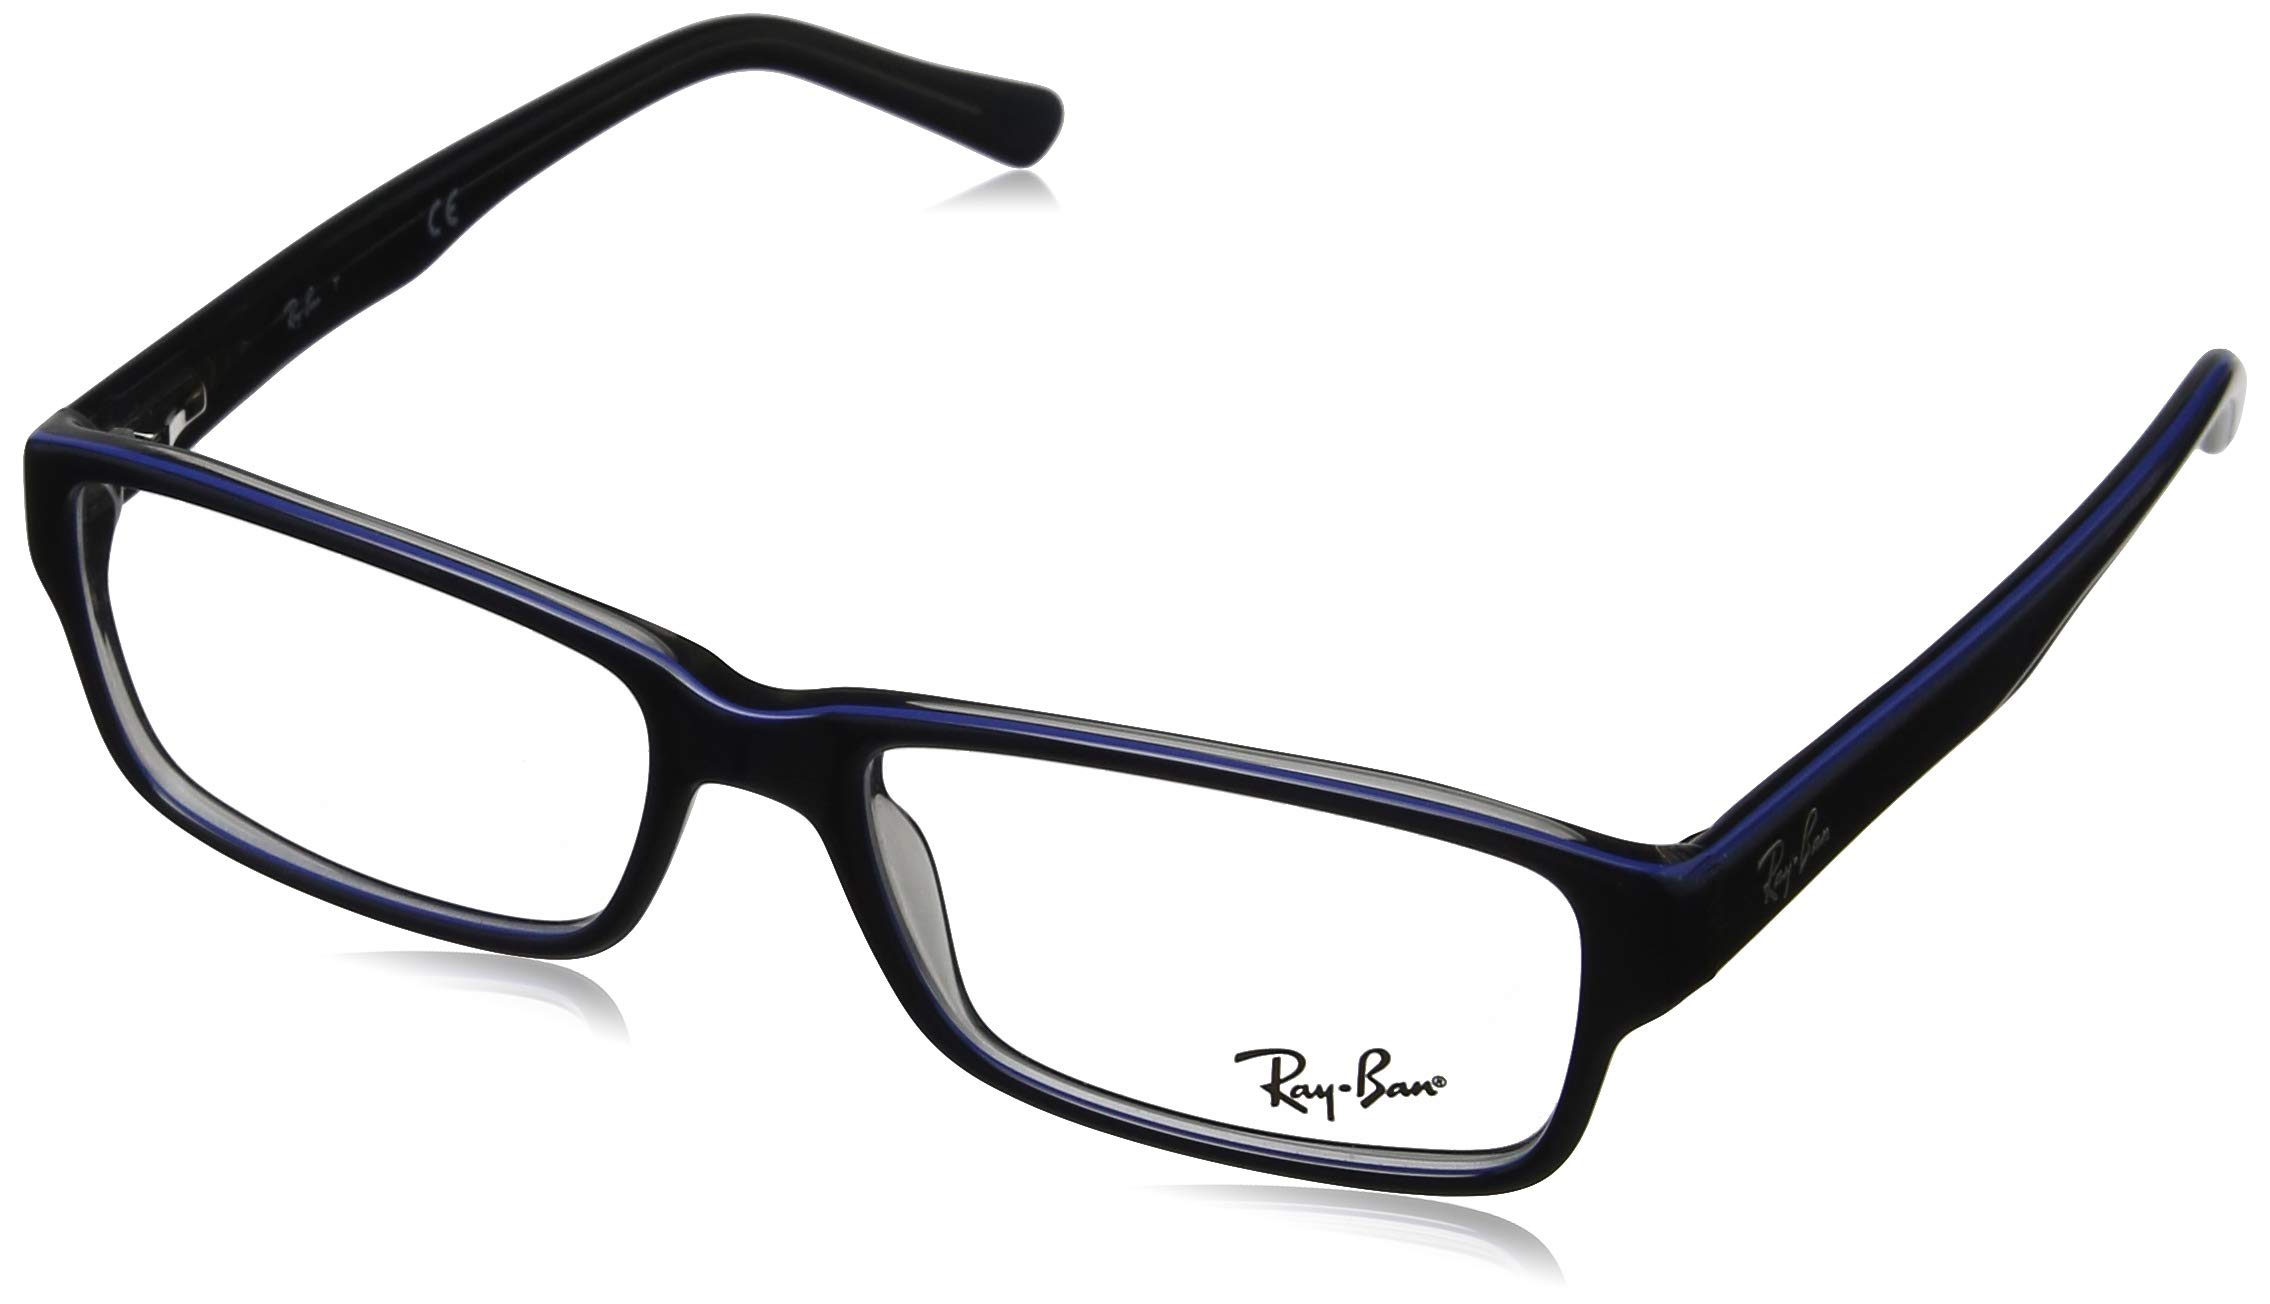 Ray-Ban RX5169 Rectangular Eyeglass Frames, Blue on Grey/Demo Lens, 54 mm